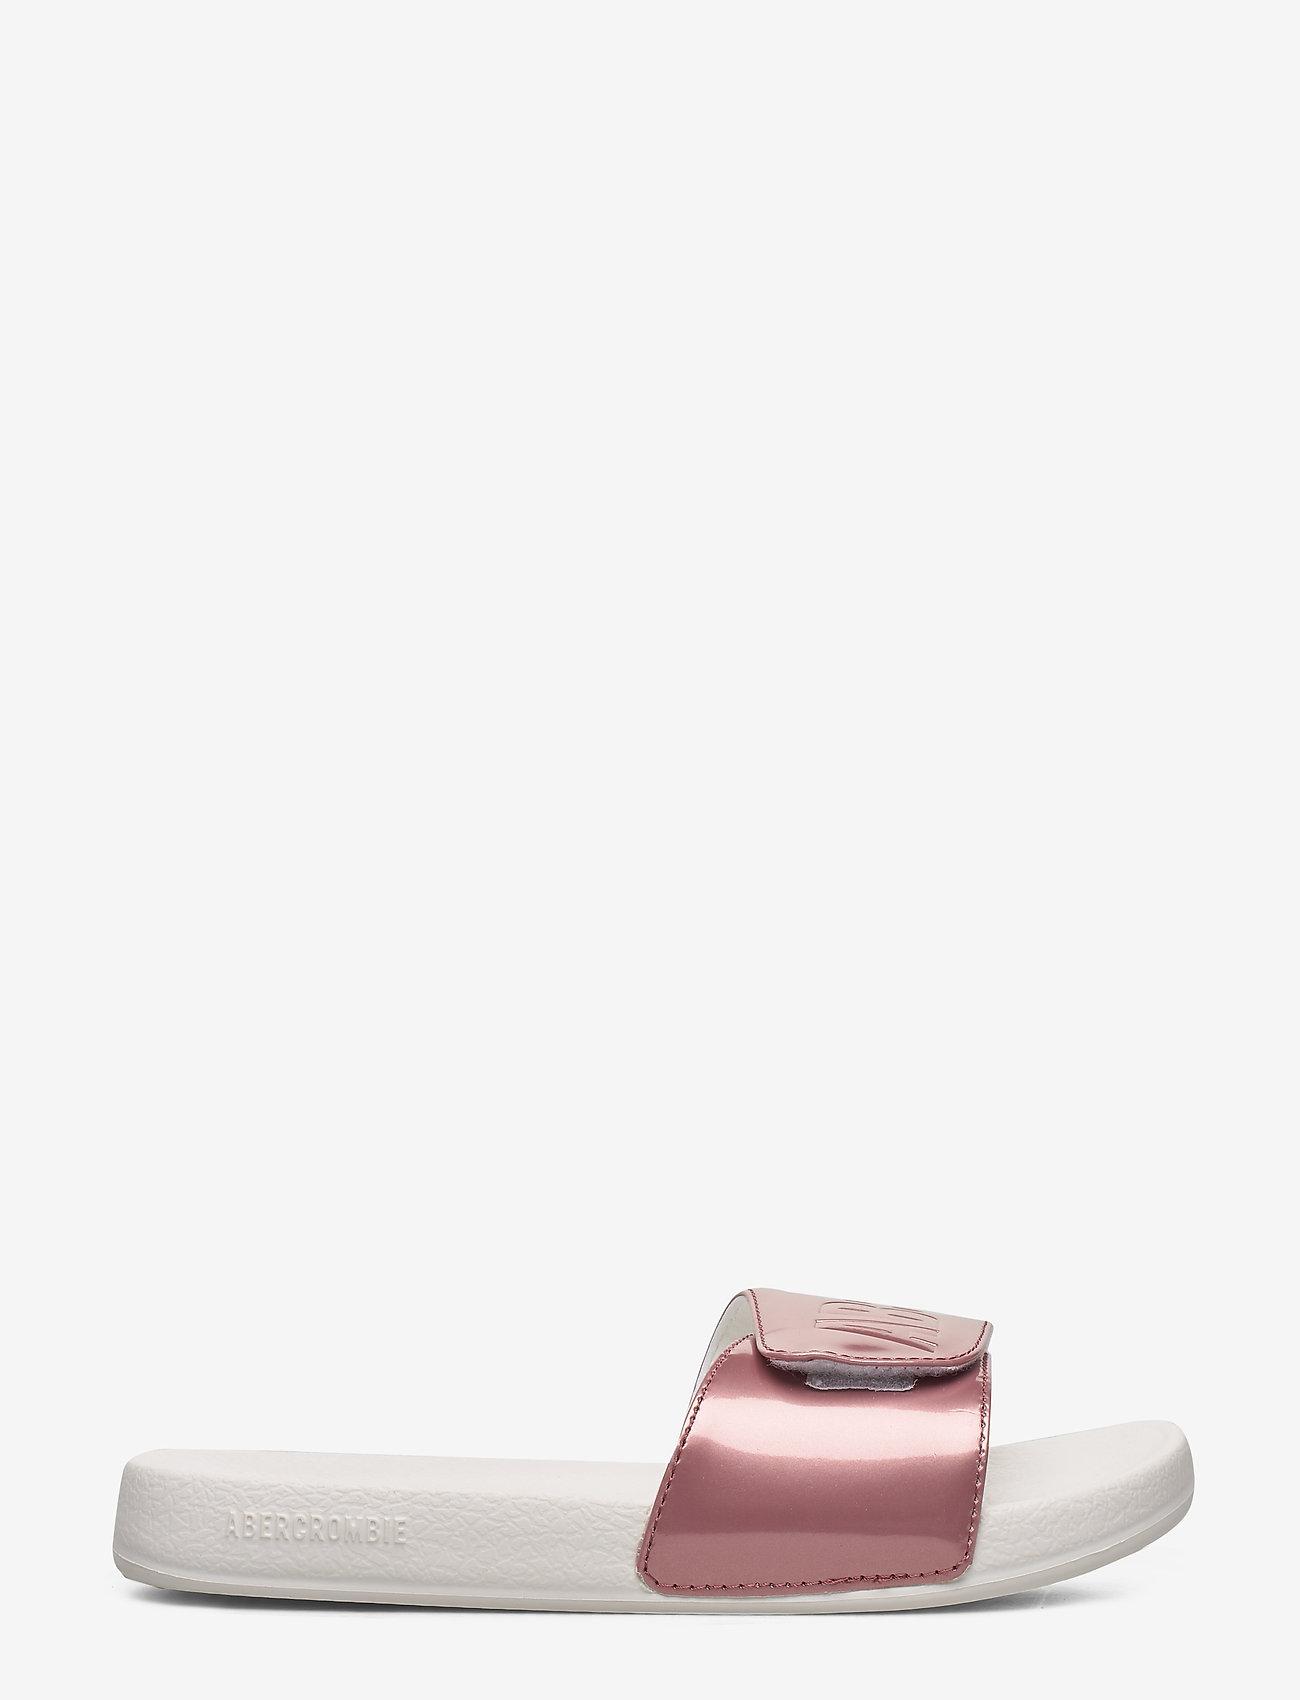 Abercrombie & Fitch - Slide Sandals - pool sliders - dark pink - 1